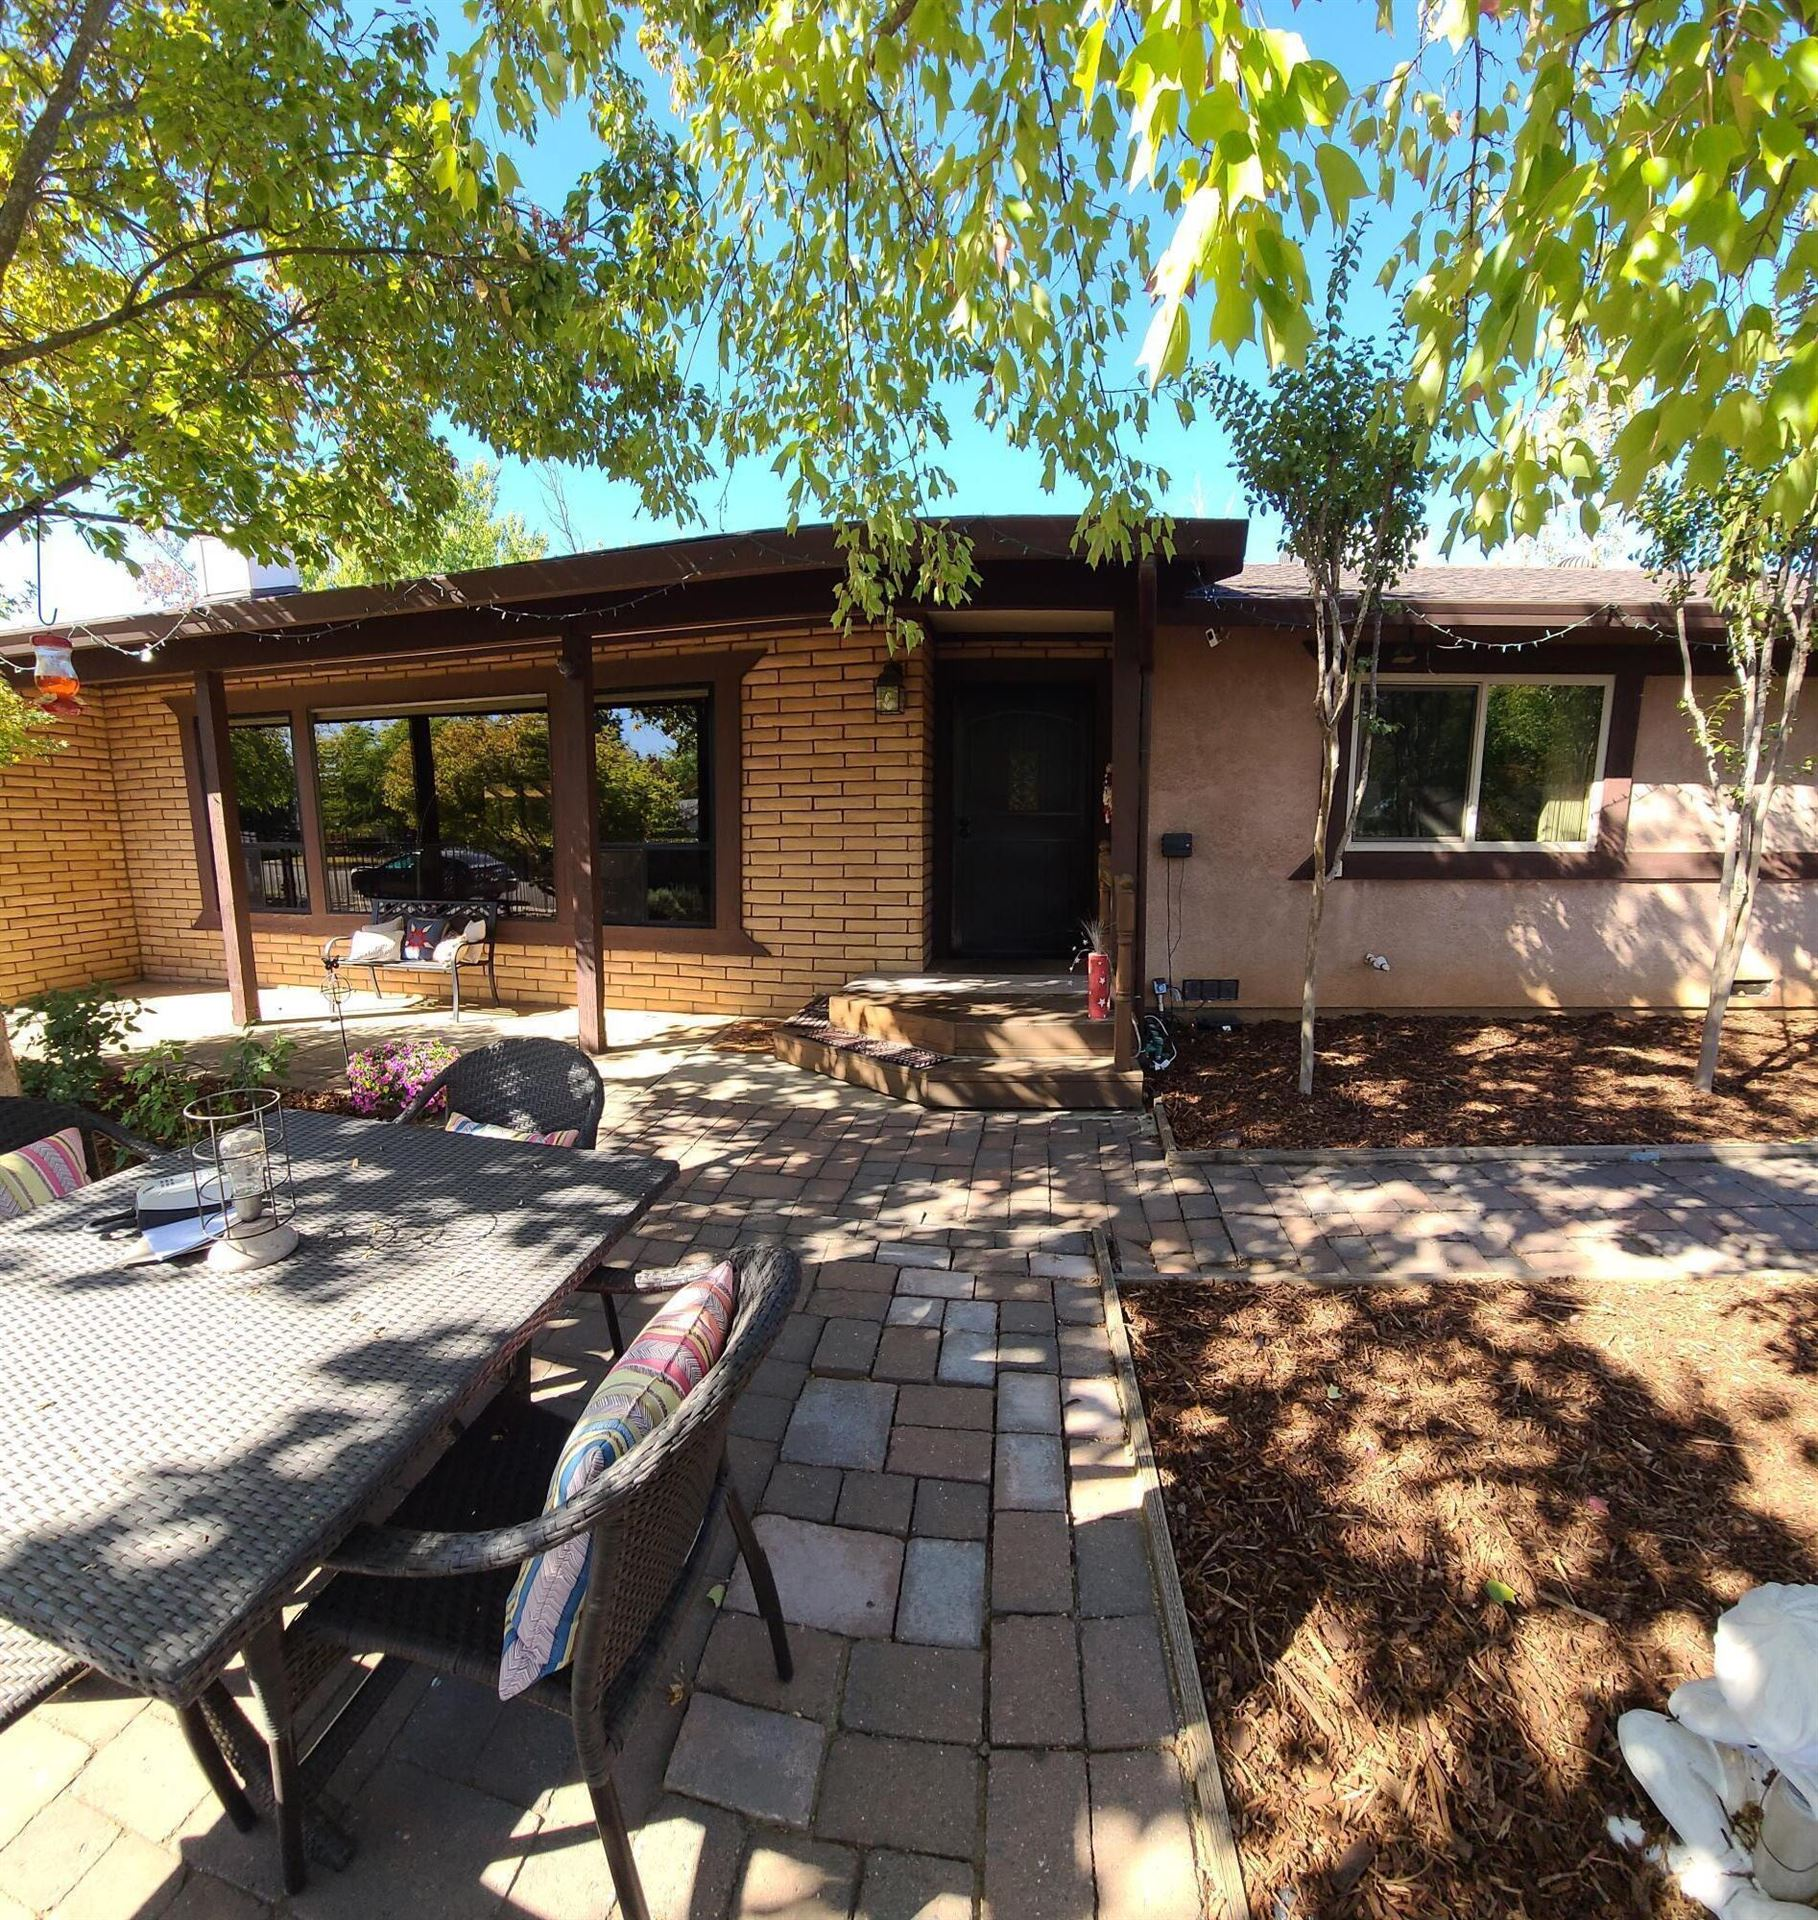 Photo of 7124 Hermosa Way, Redding, CA 96002 (MLS # 21-4925)